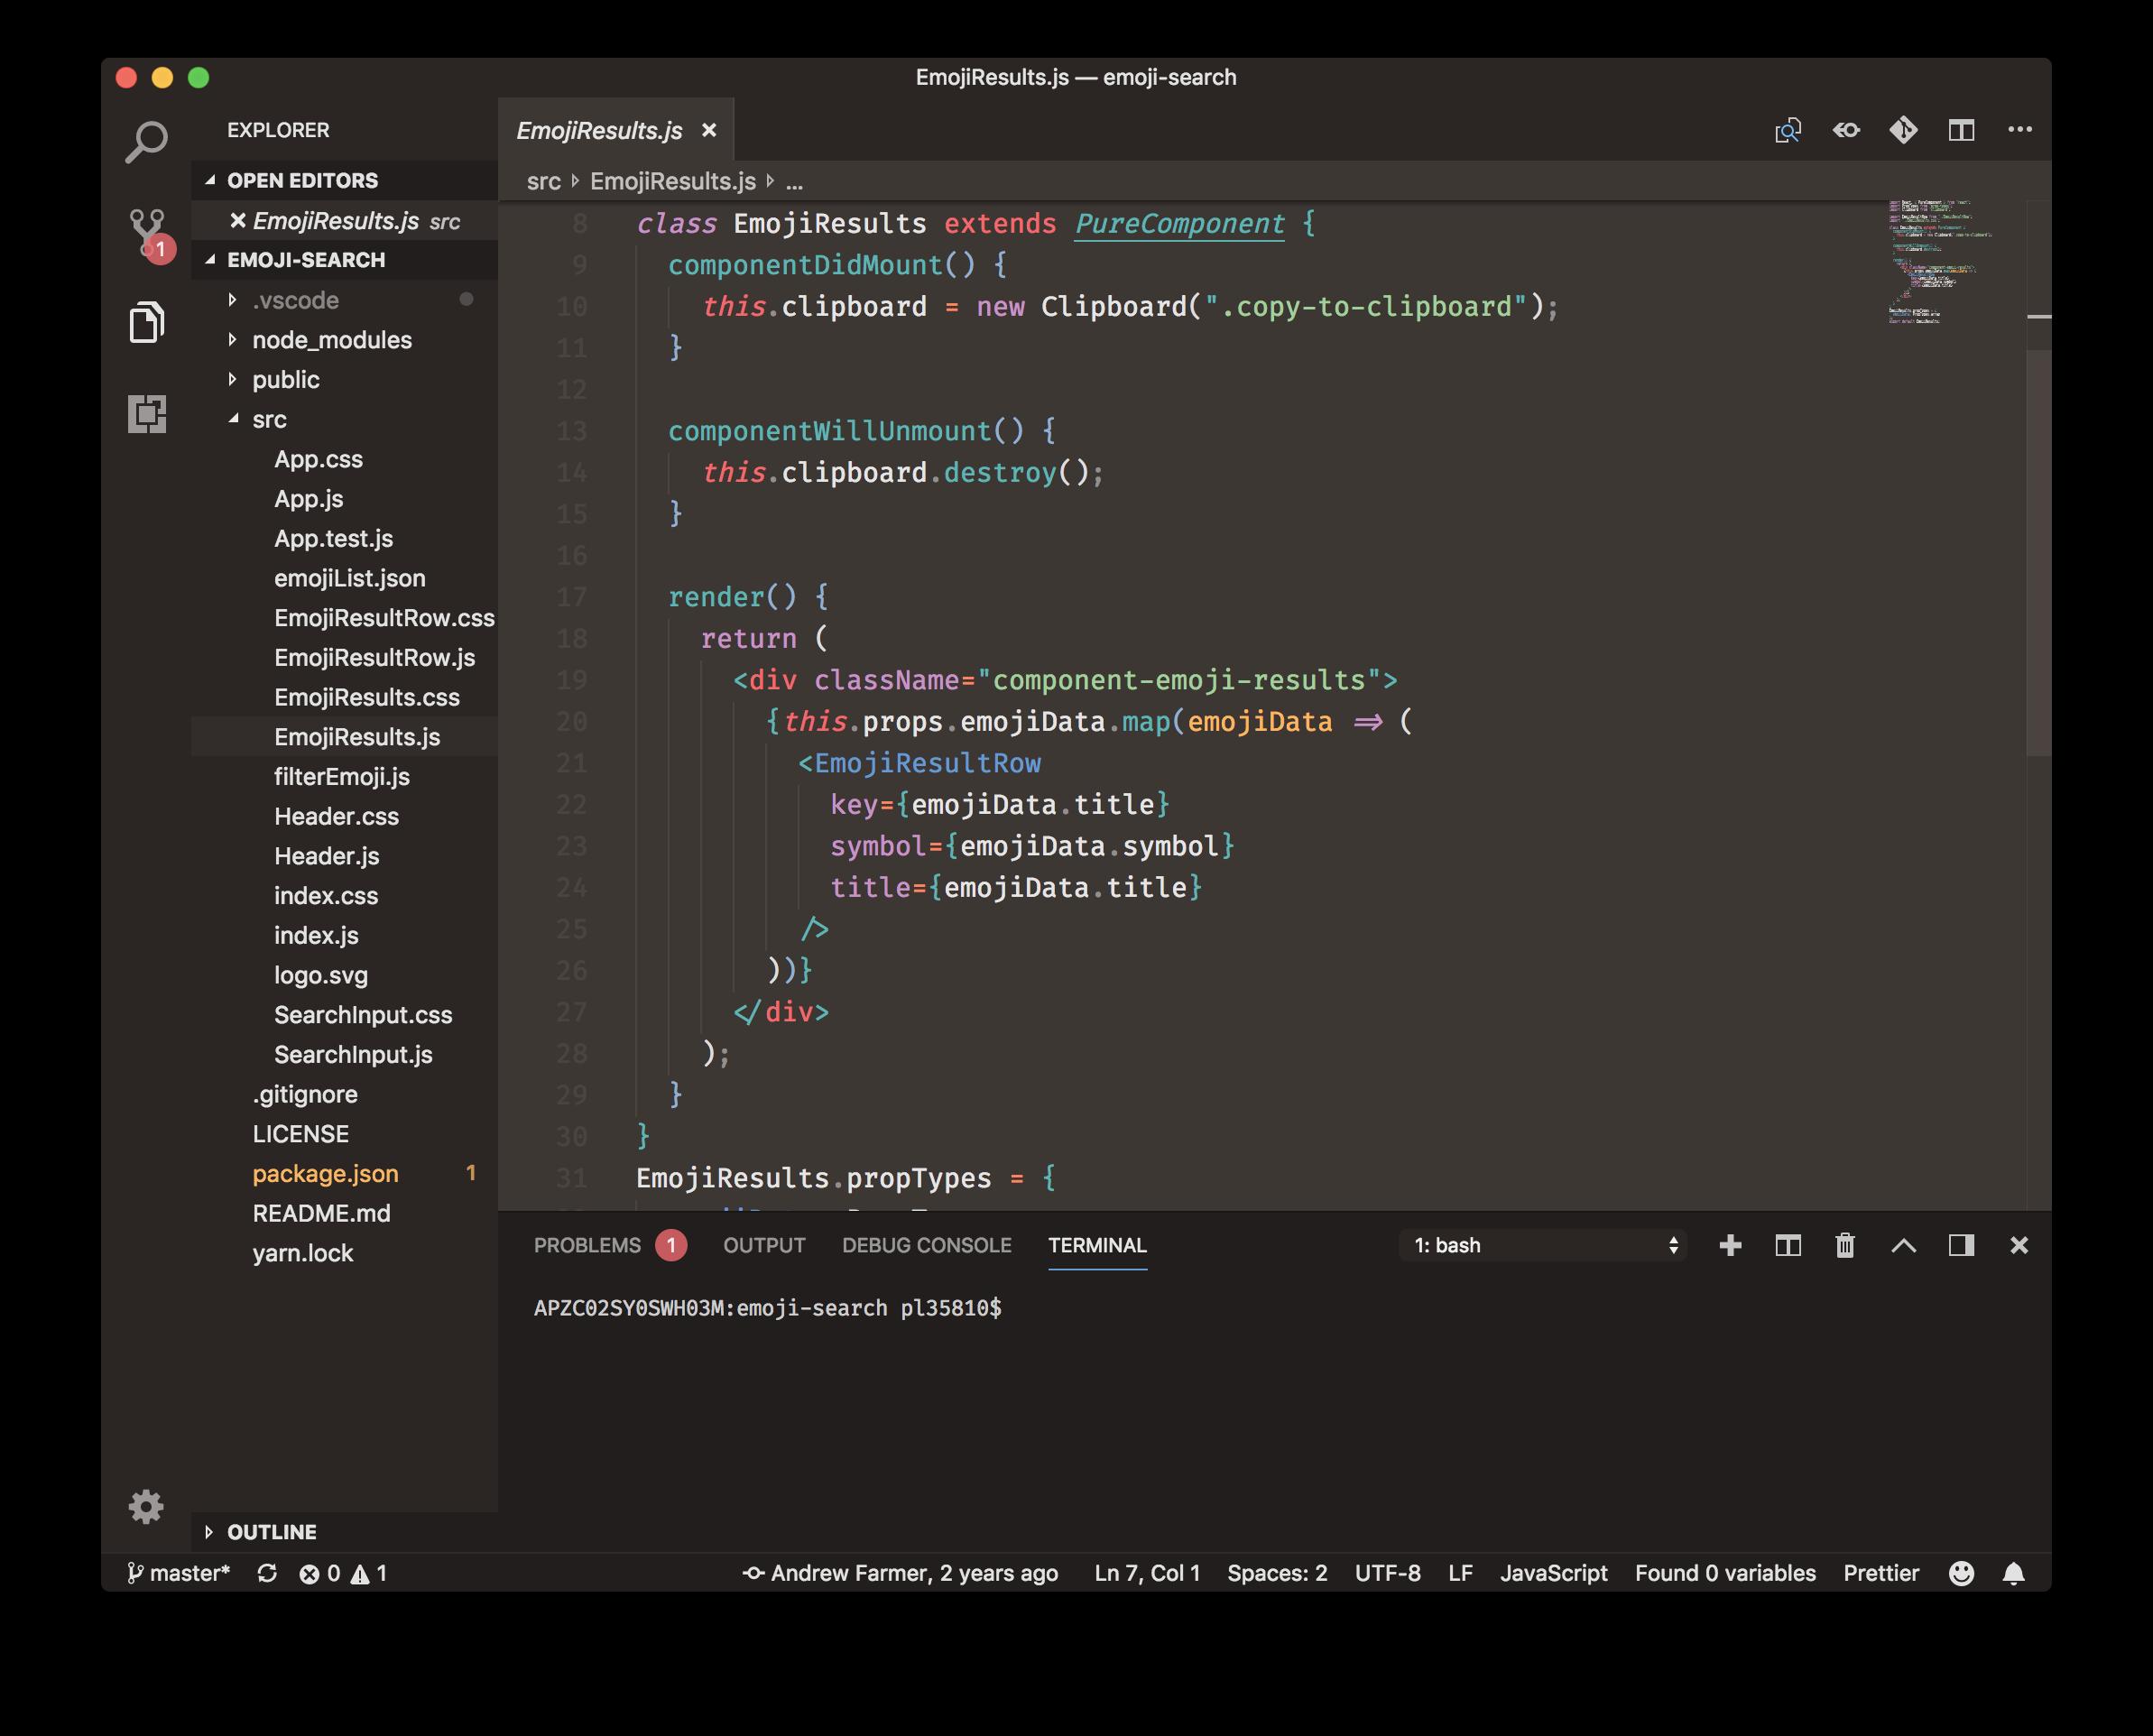 Mariana Pro Terminal Screenshot